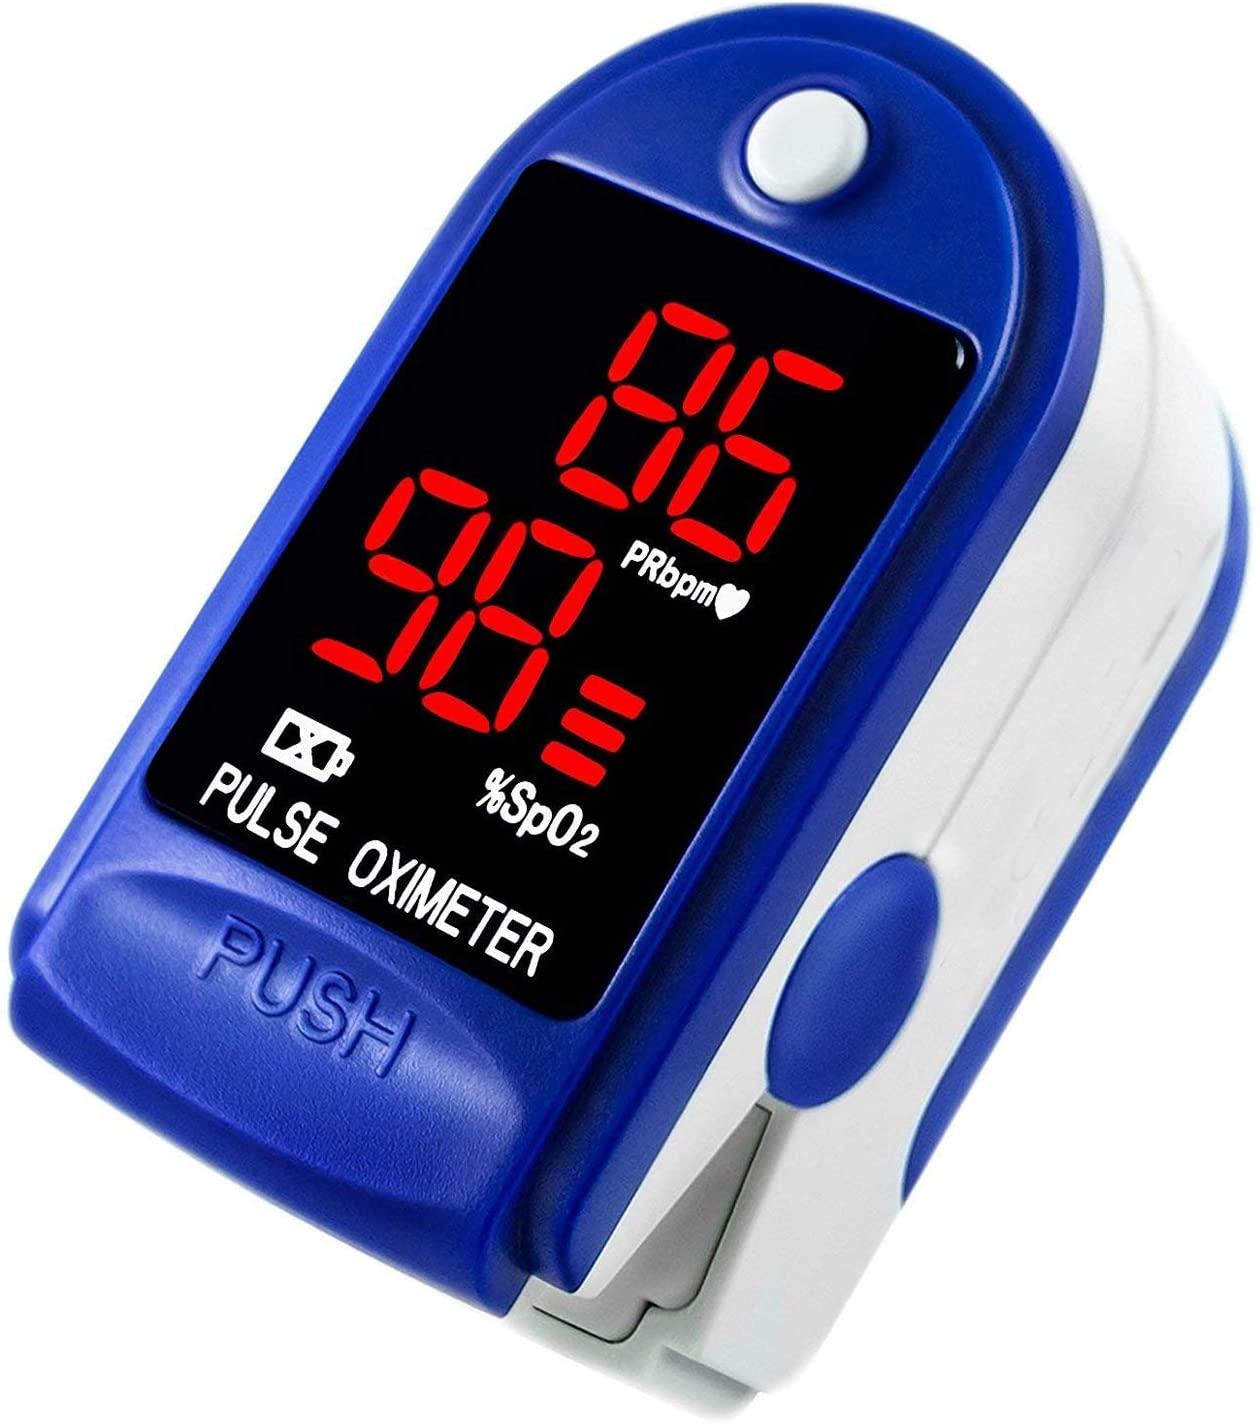 Pulse oximeter, Pulse oximeters, oximeter